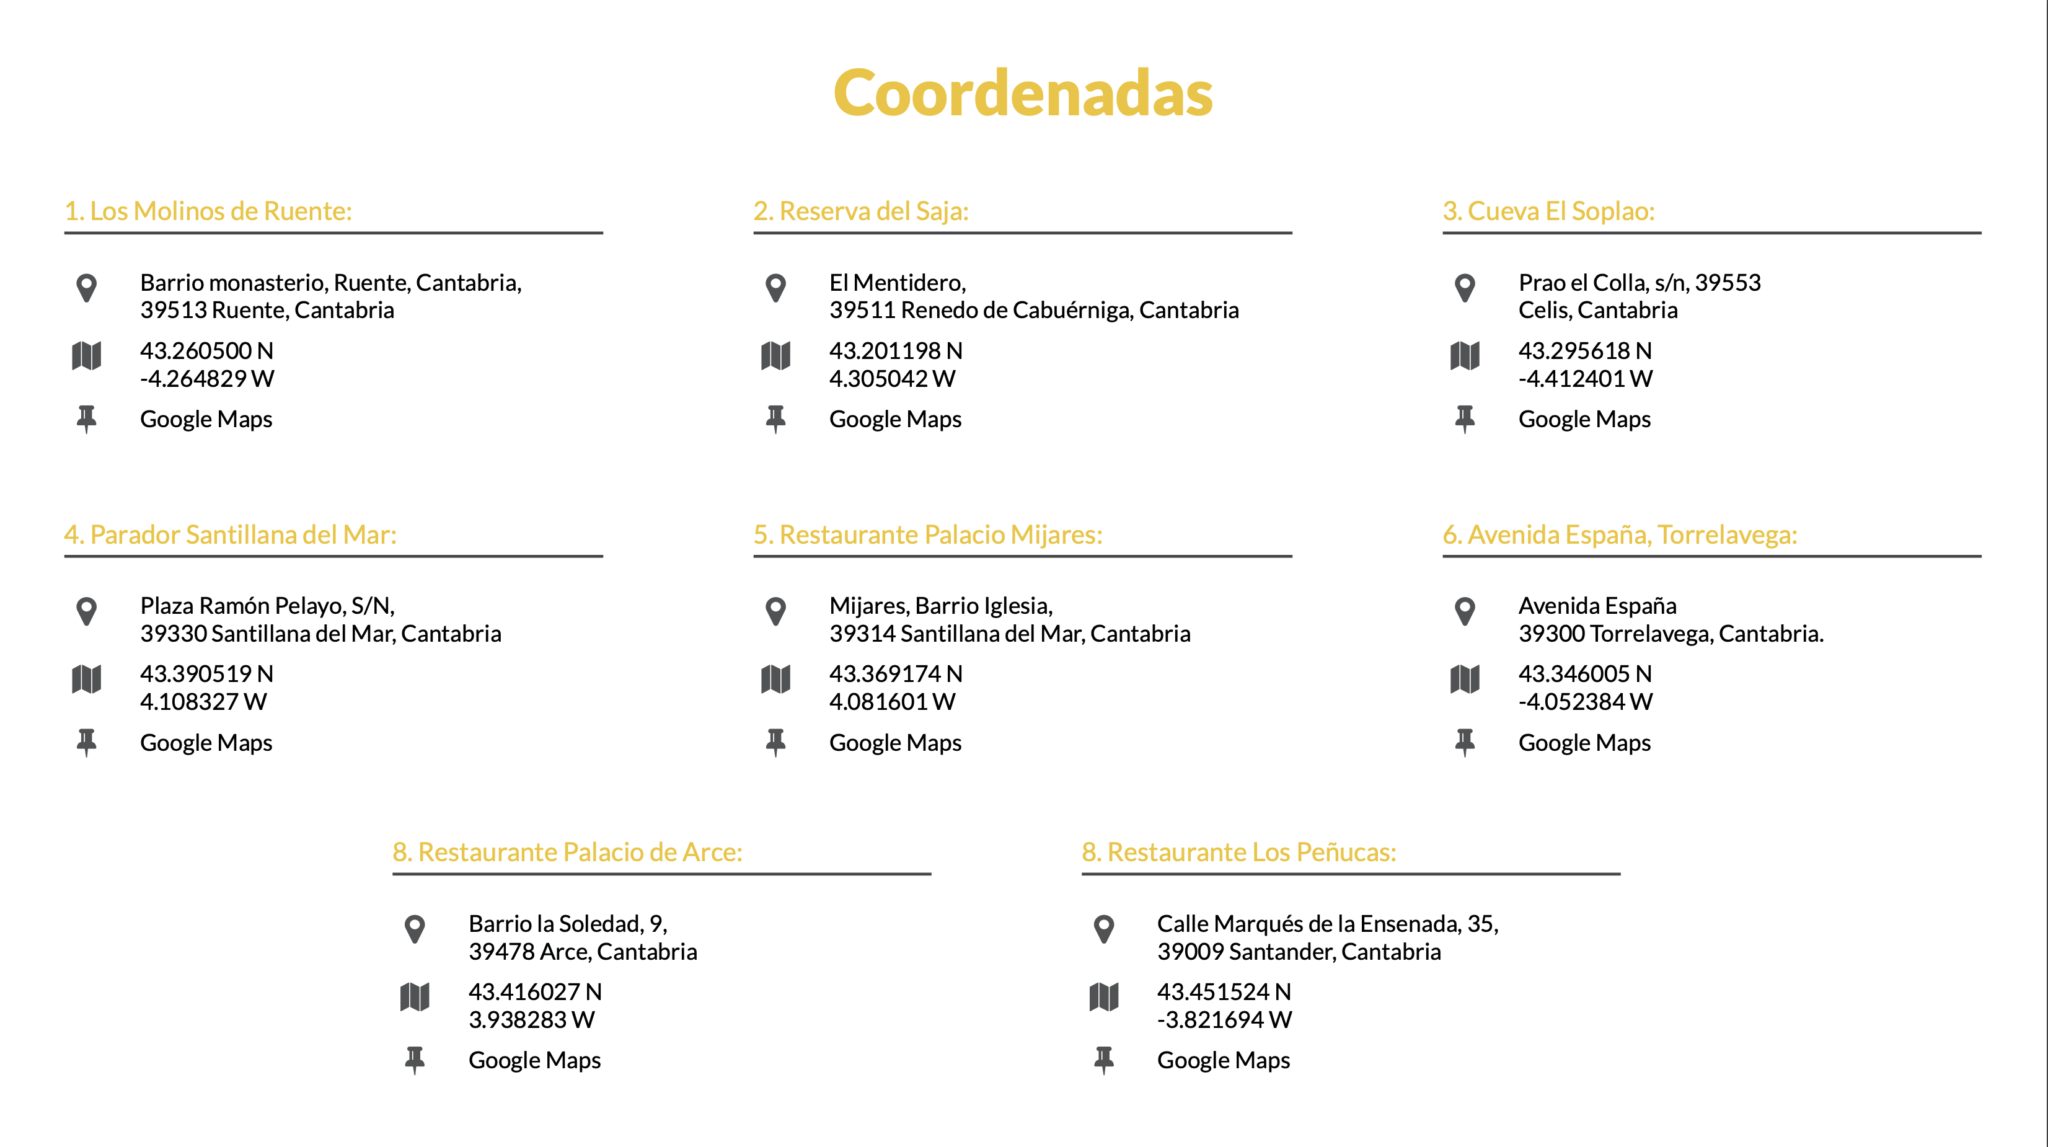 Ubicaciones 52 Supercars en Torrelavega